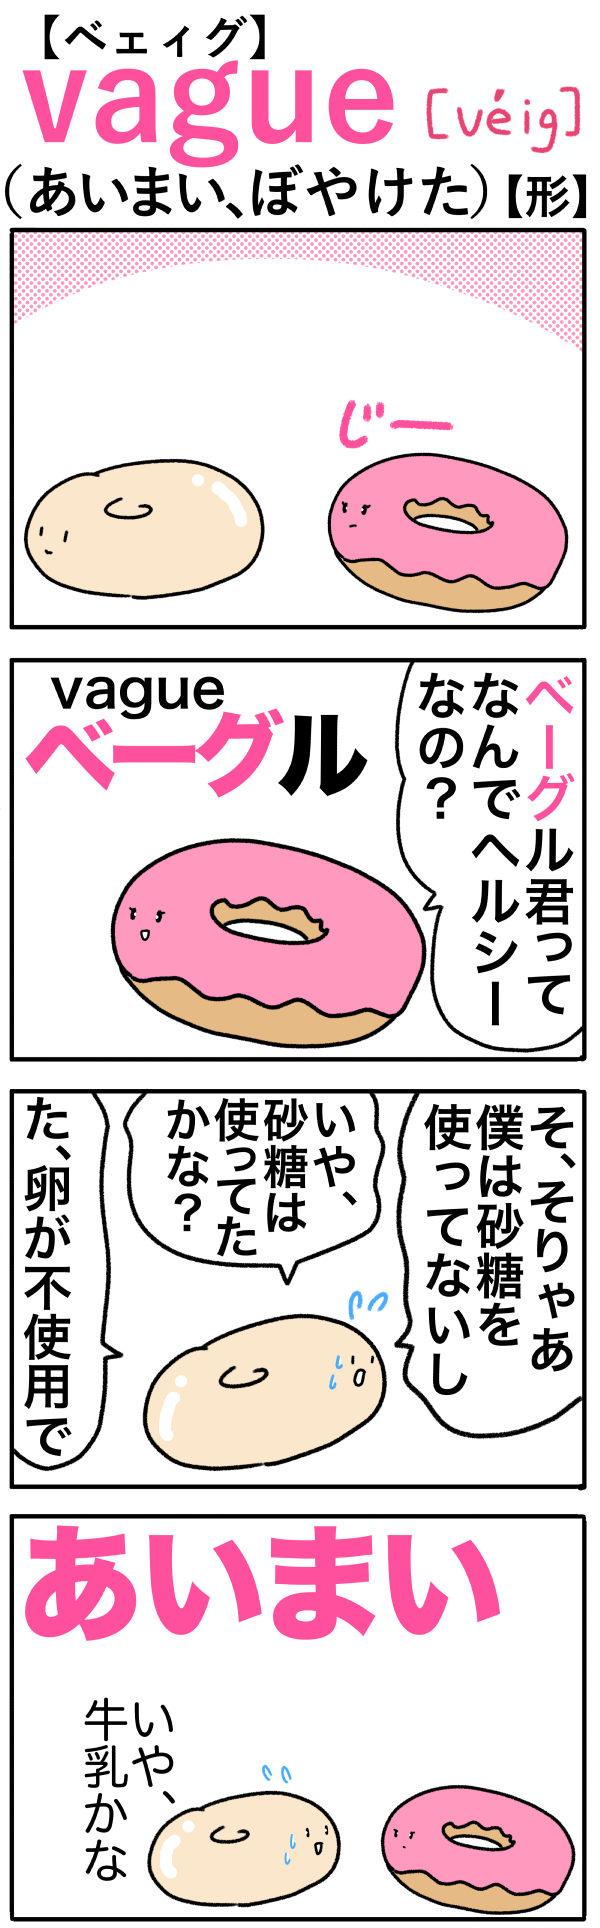 vague(あいまい、ぼやけた)